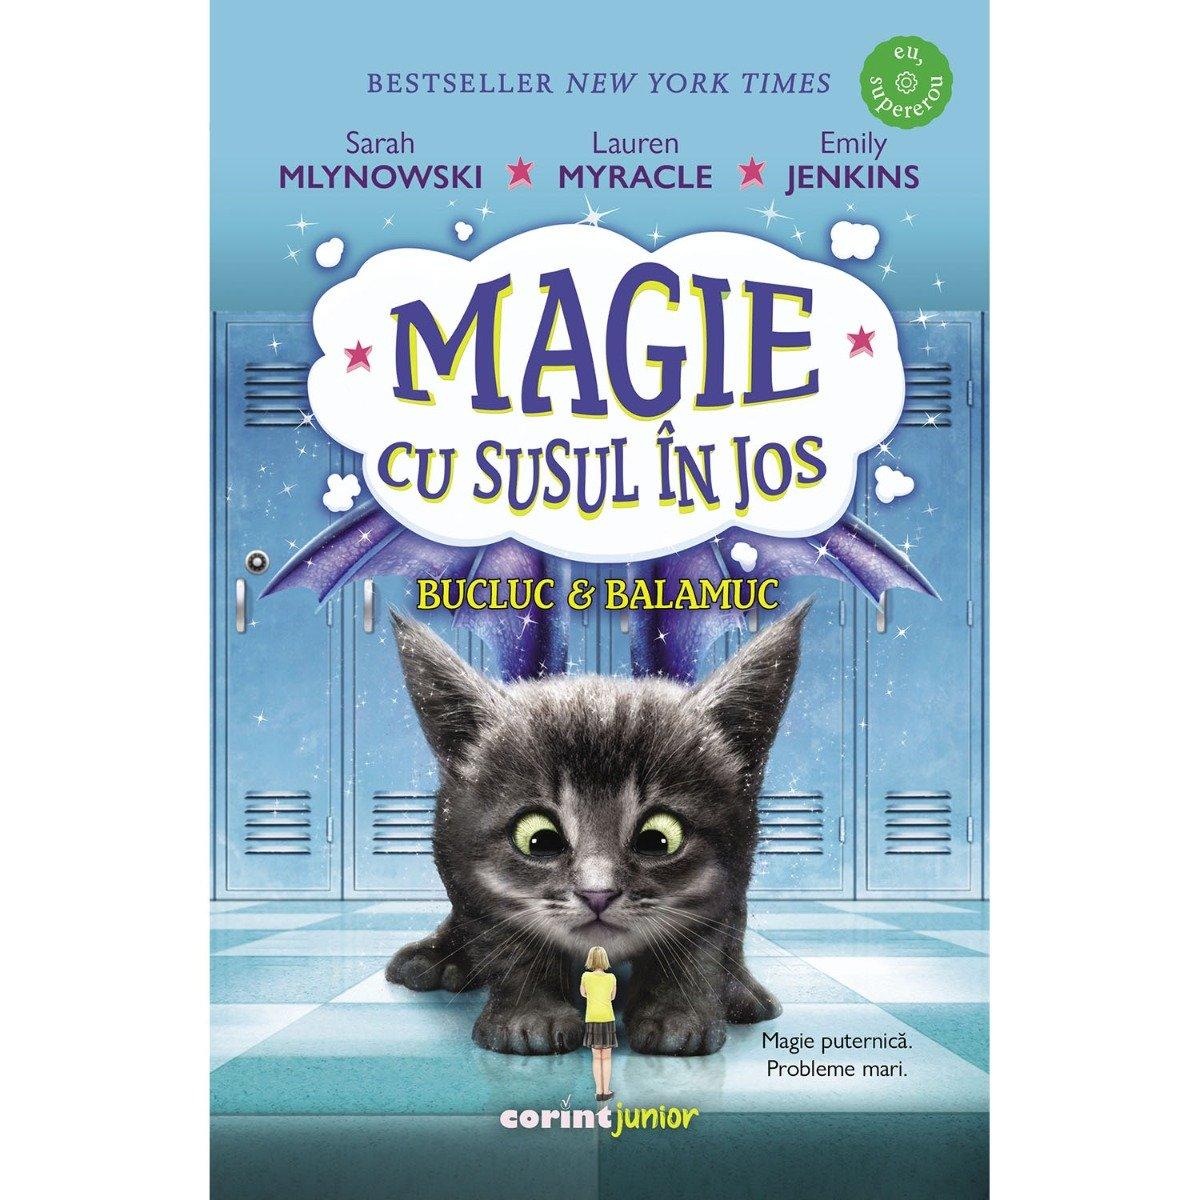 Magie cu susul in jos, Bucluc si balamuc, Vol. 2, Sarah Mlynowski, Lauren Myracle, Emily Jenkins